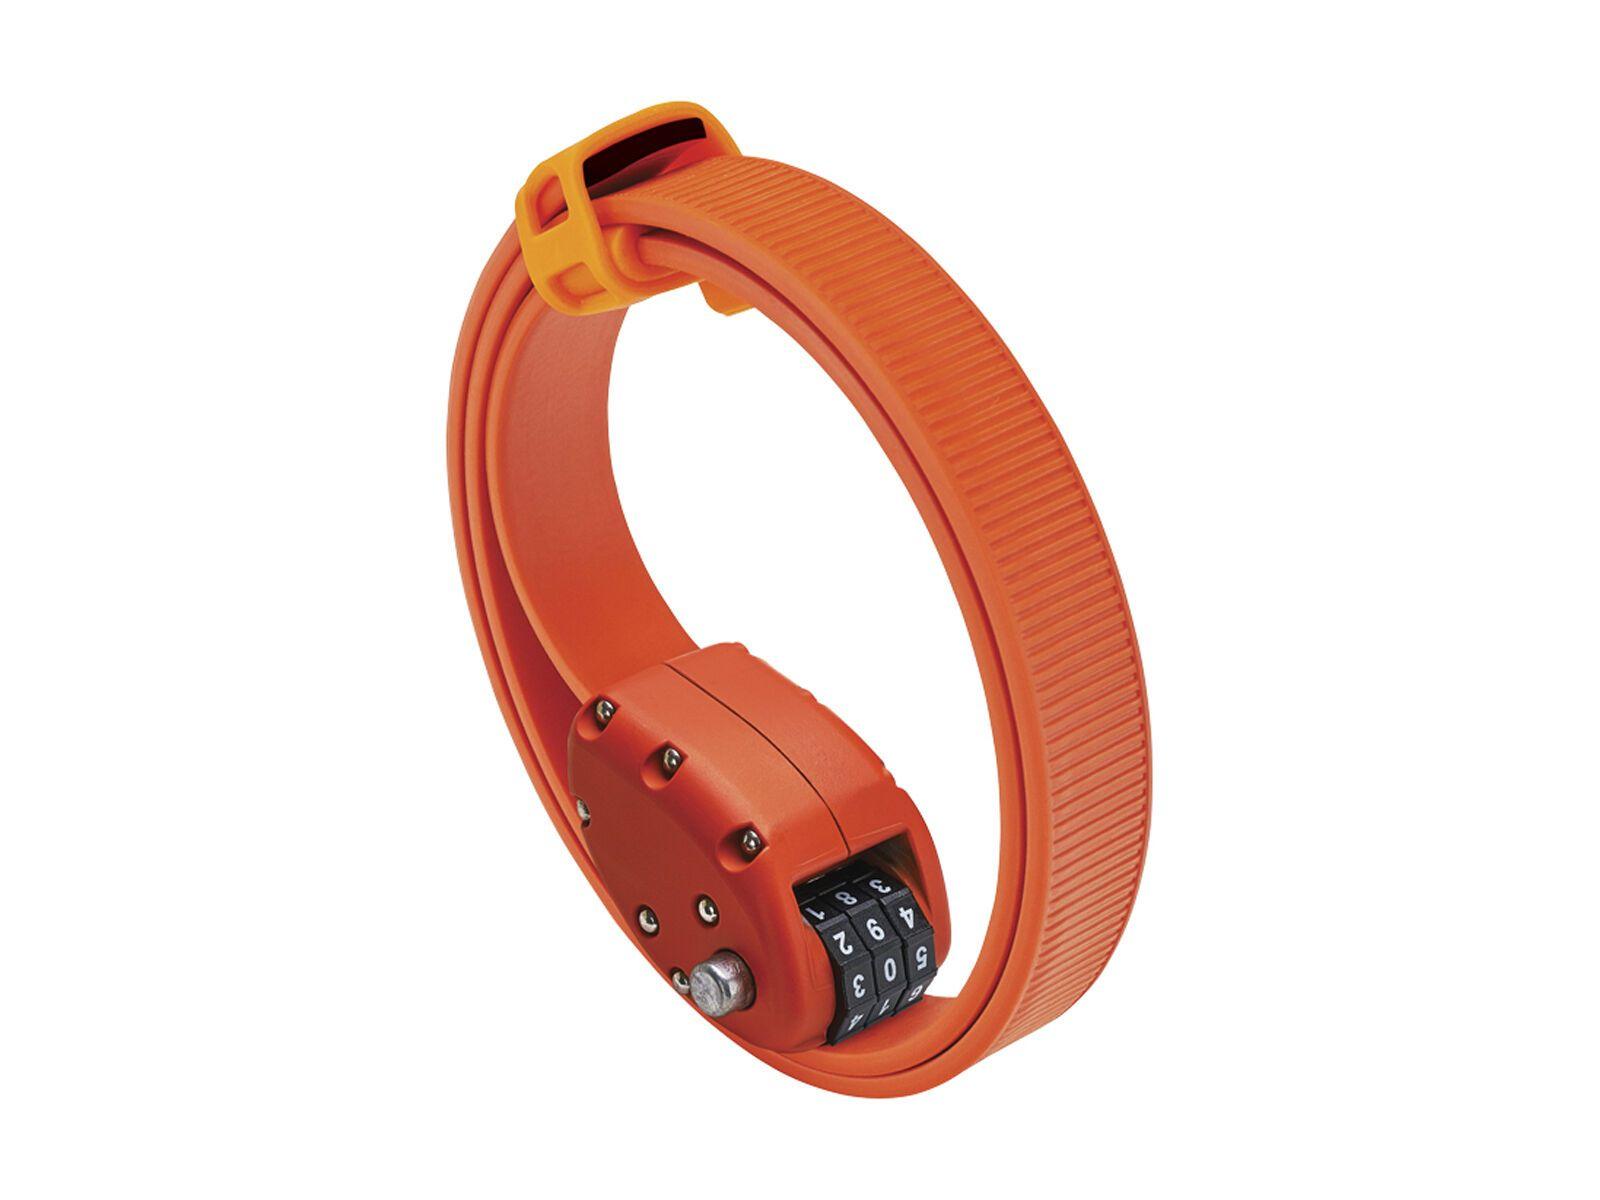 Otto DesignWorks Ottolock Cinch Lock - 76 cm, orange - Fahrradschloss 202043